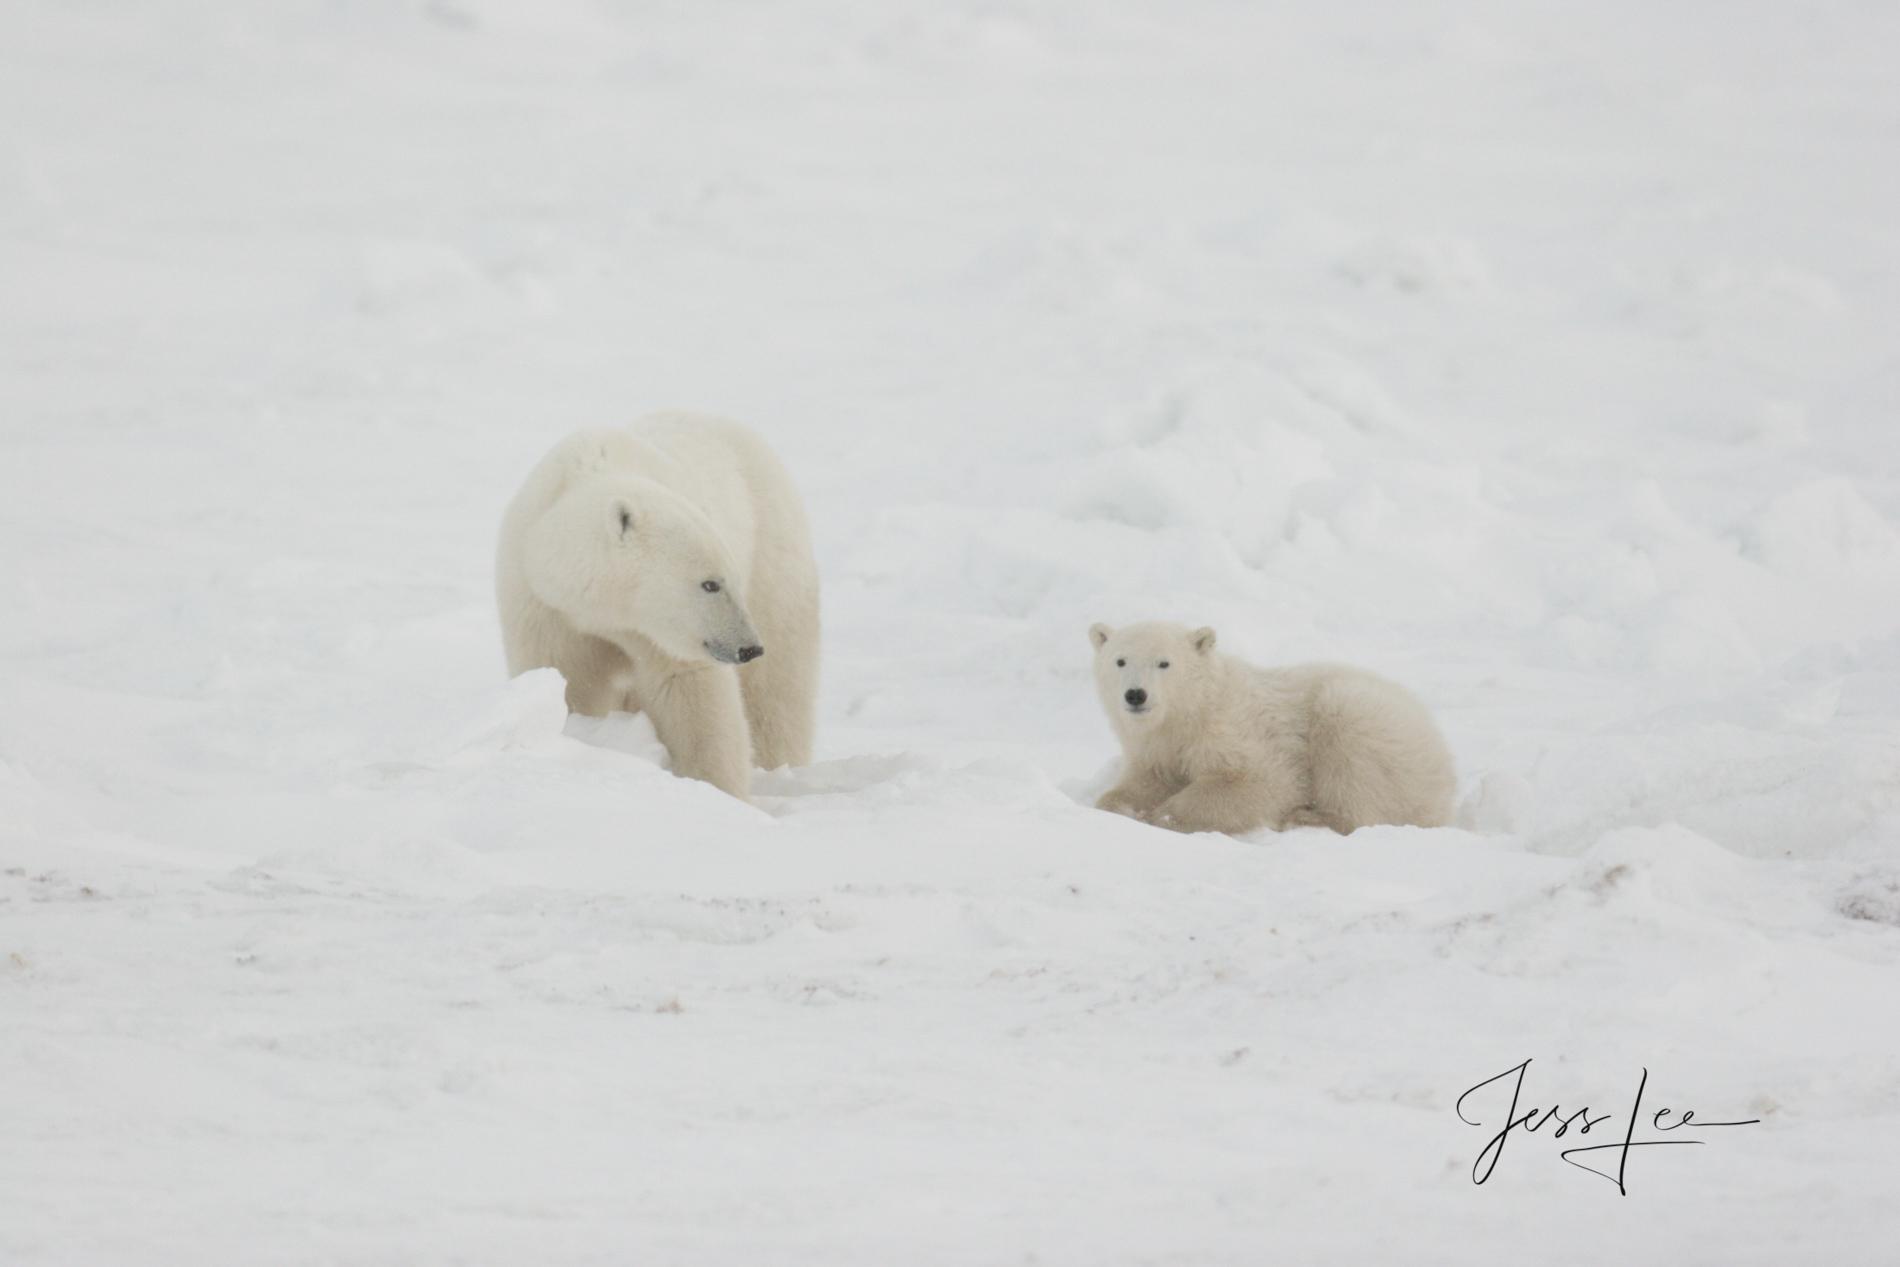 Canada Polar bear in warming Hudsons bay, arctic, arctic Canada, bear, bears, churchill, mammal, Manitoba, marine, polar, polar bear, polar bears, photo